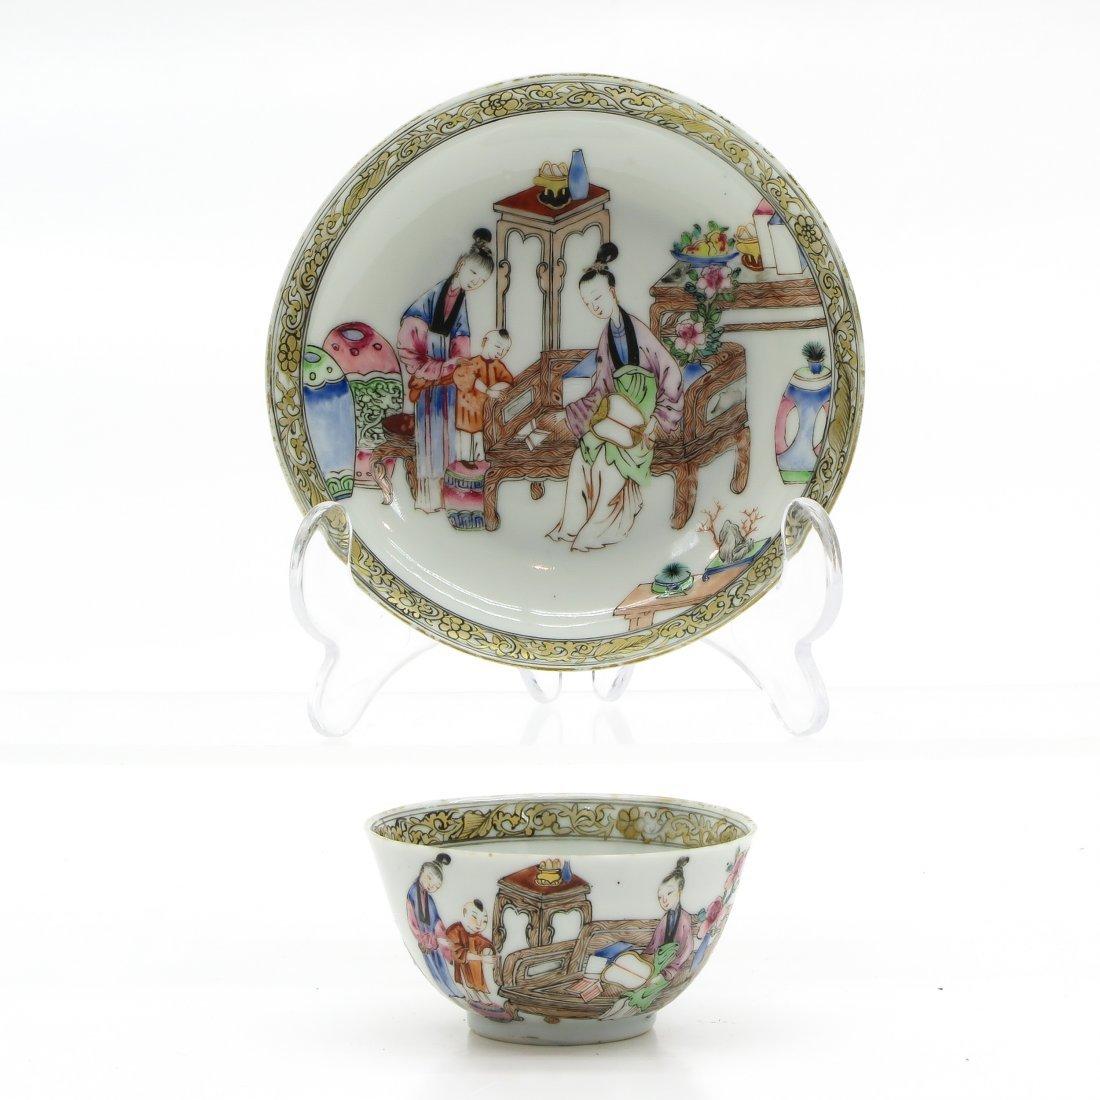 China Porcelain Yongzheng Period Cup and Saucer